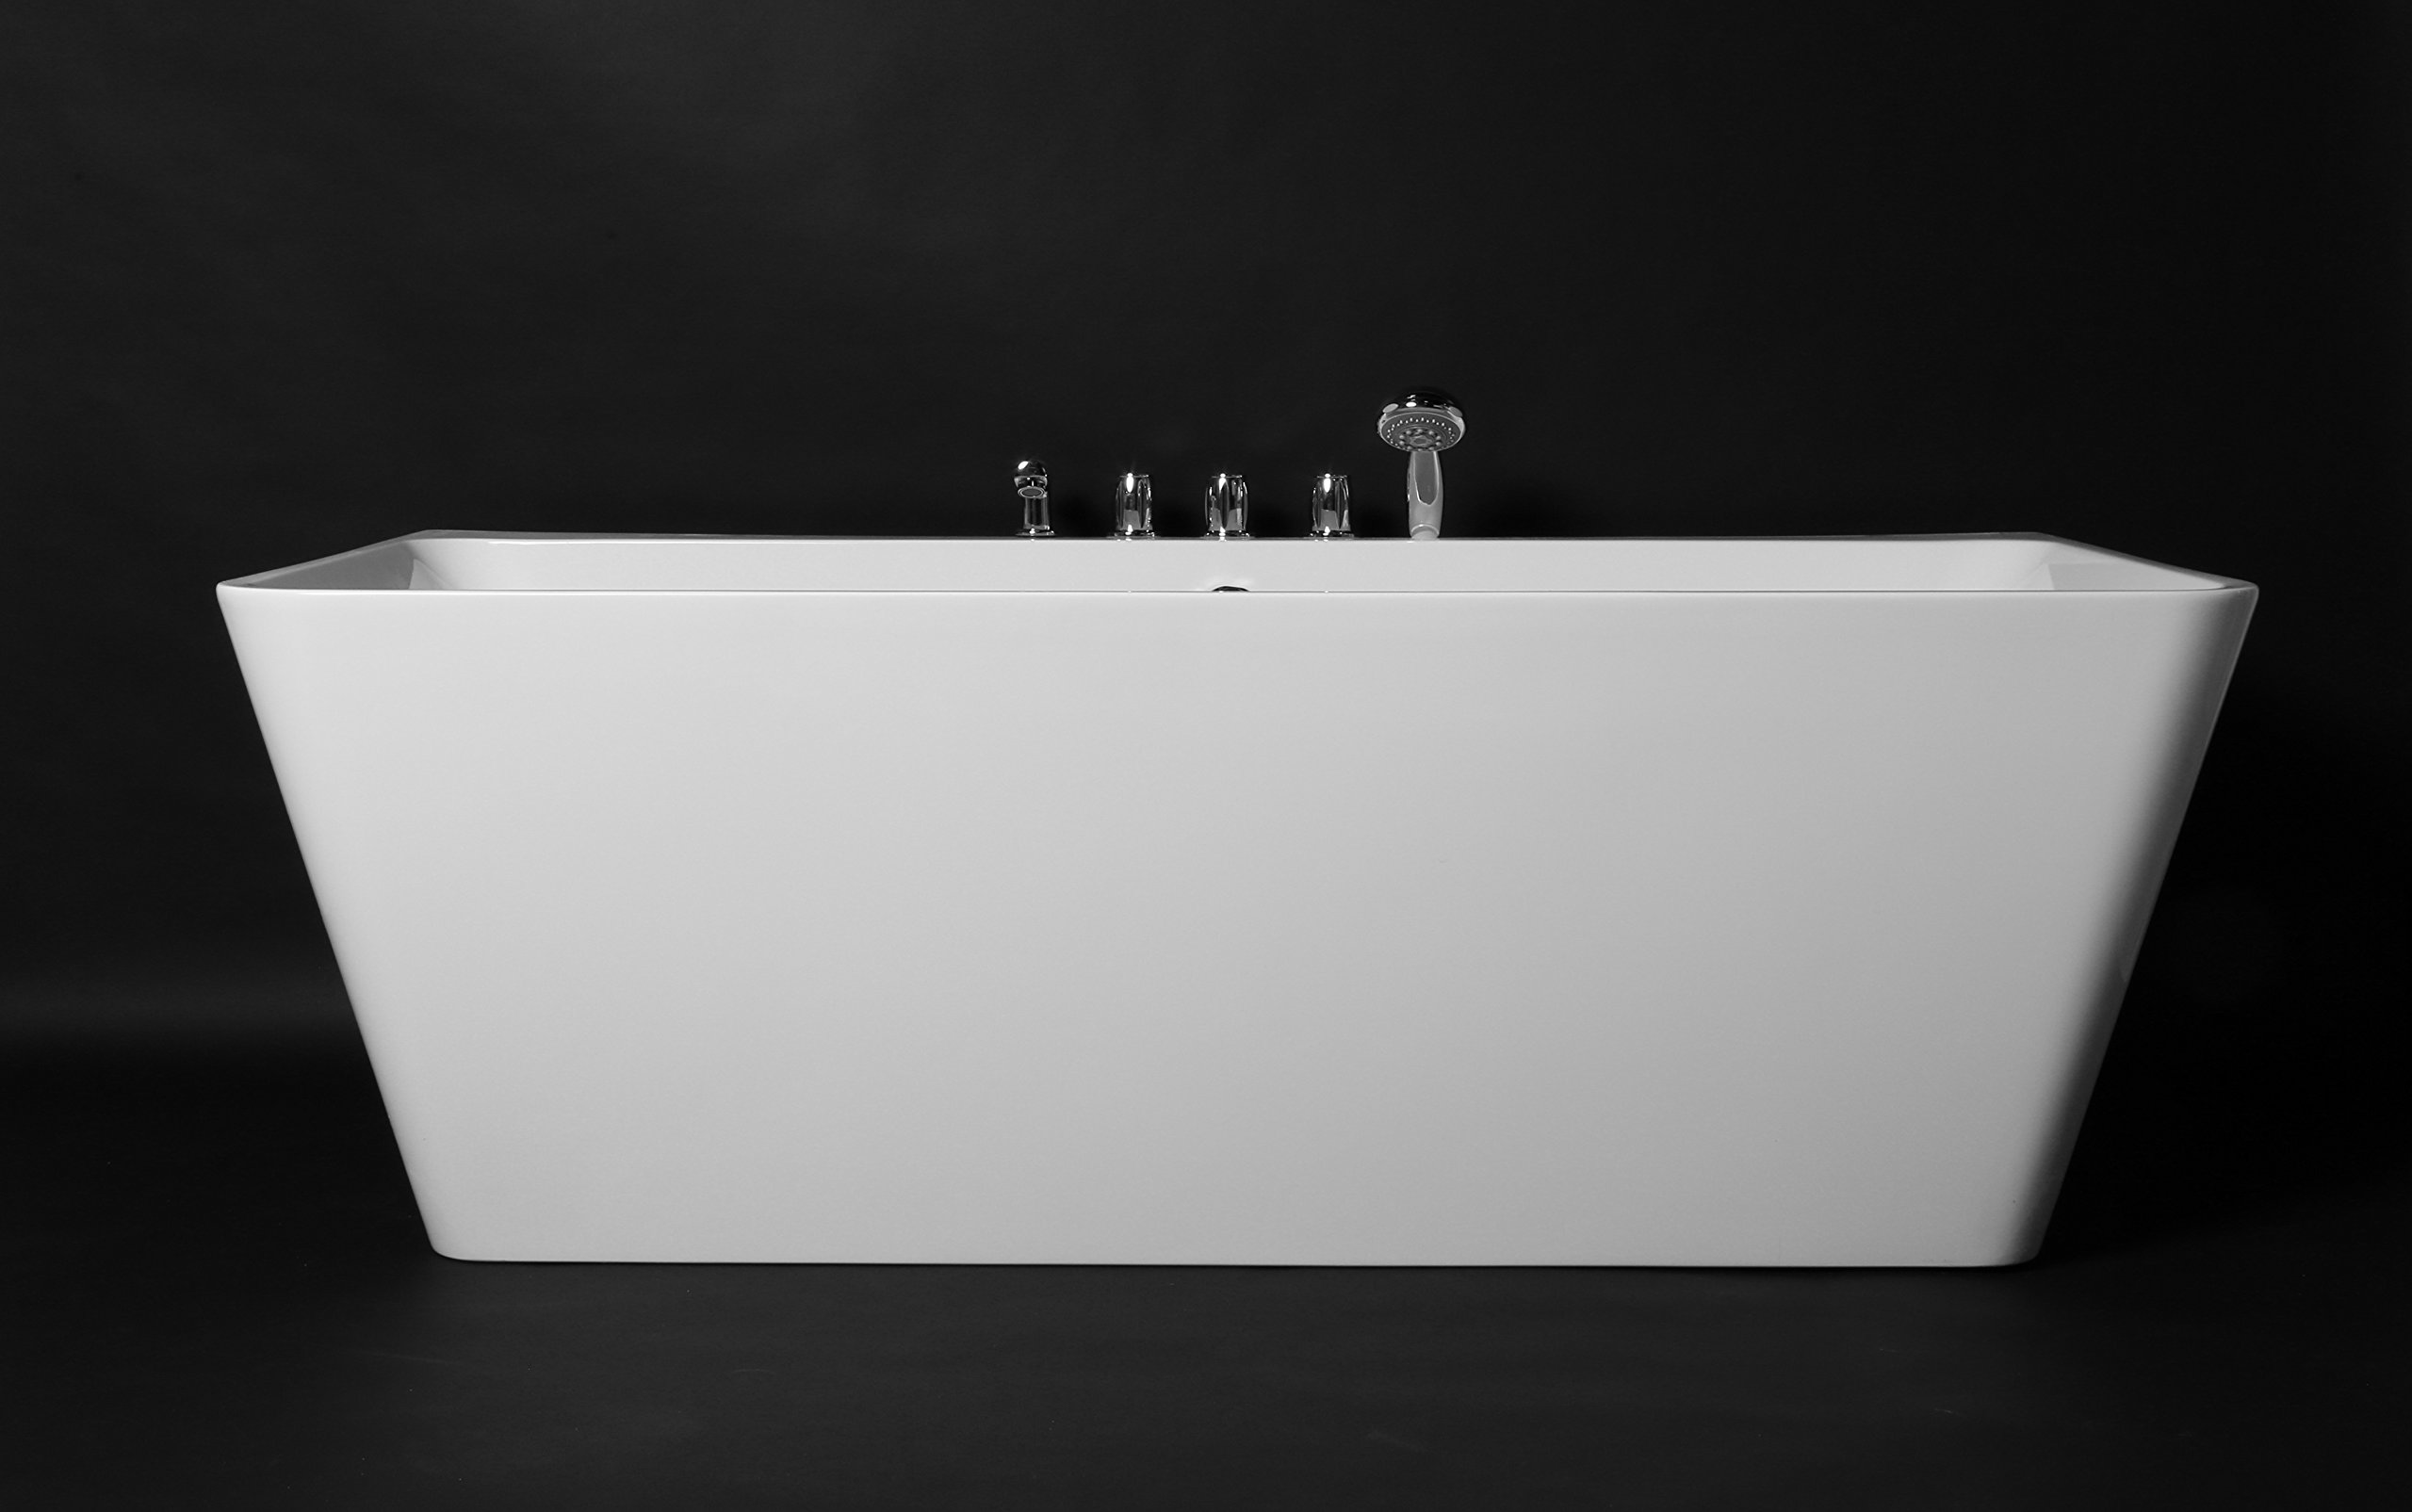 Kokss Iseo 67'' Modern Acrylic Bath Tub With Chrome Finish & Tub Filler Faucet, Freestanding, White, square, Rest, Bathe, Luxury spa hot tub, Seamless Bathroom Soaking, New 2016 Design Model